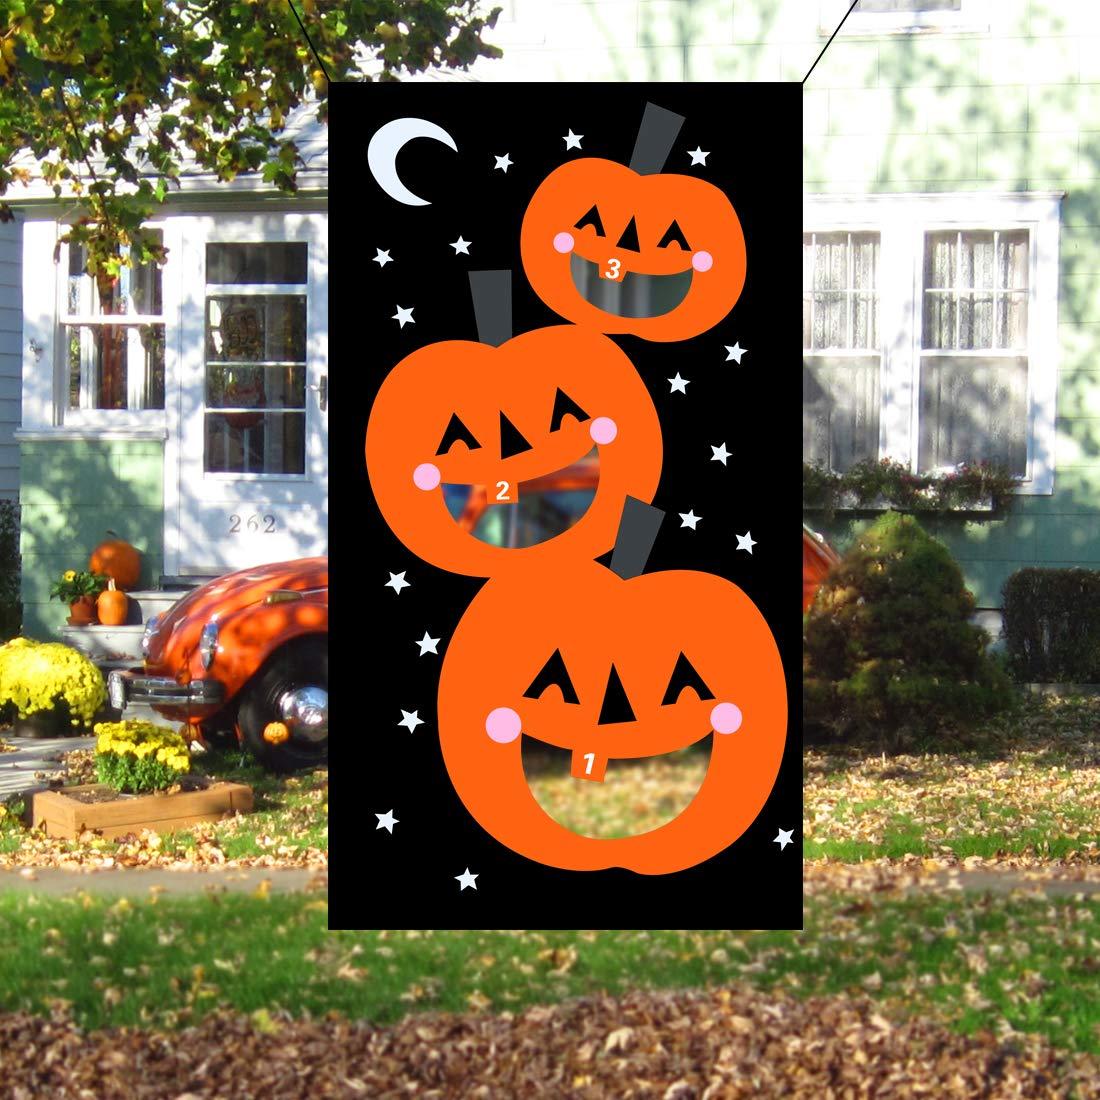 JINSEY Halloween Pumpkin Bean Bag Toss Games with 3 Bean Bags, Halloween Games for Kids Party Decoration